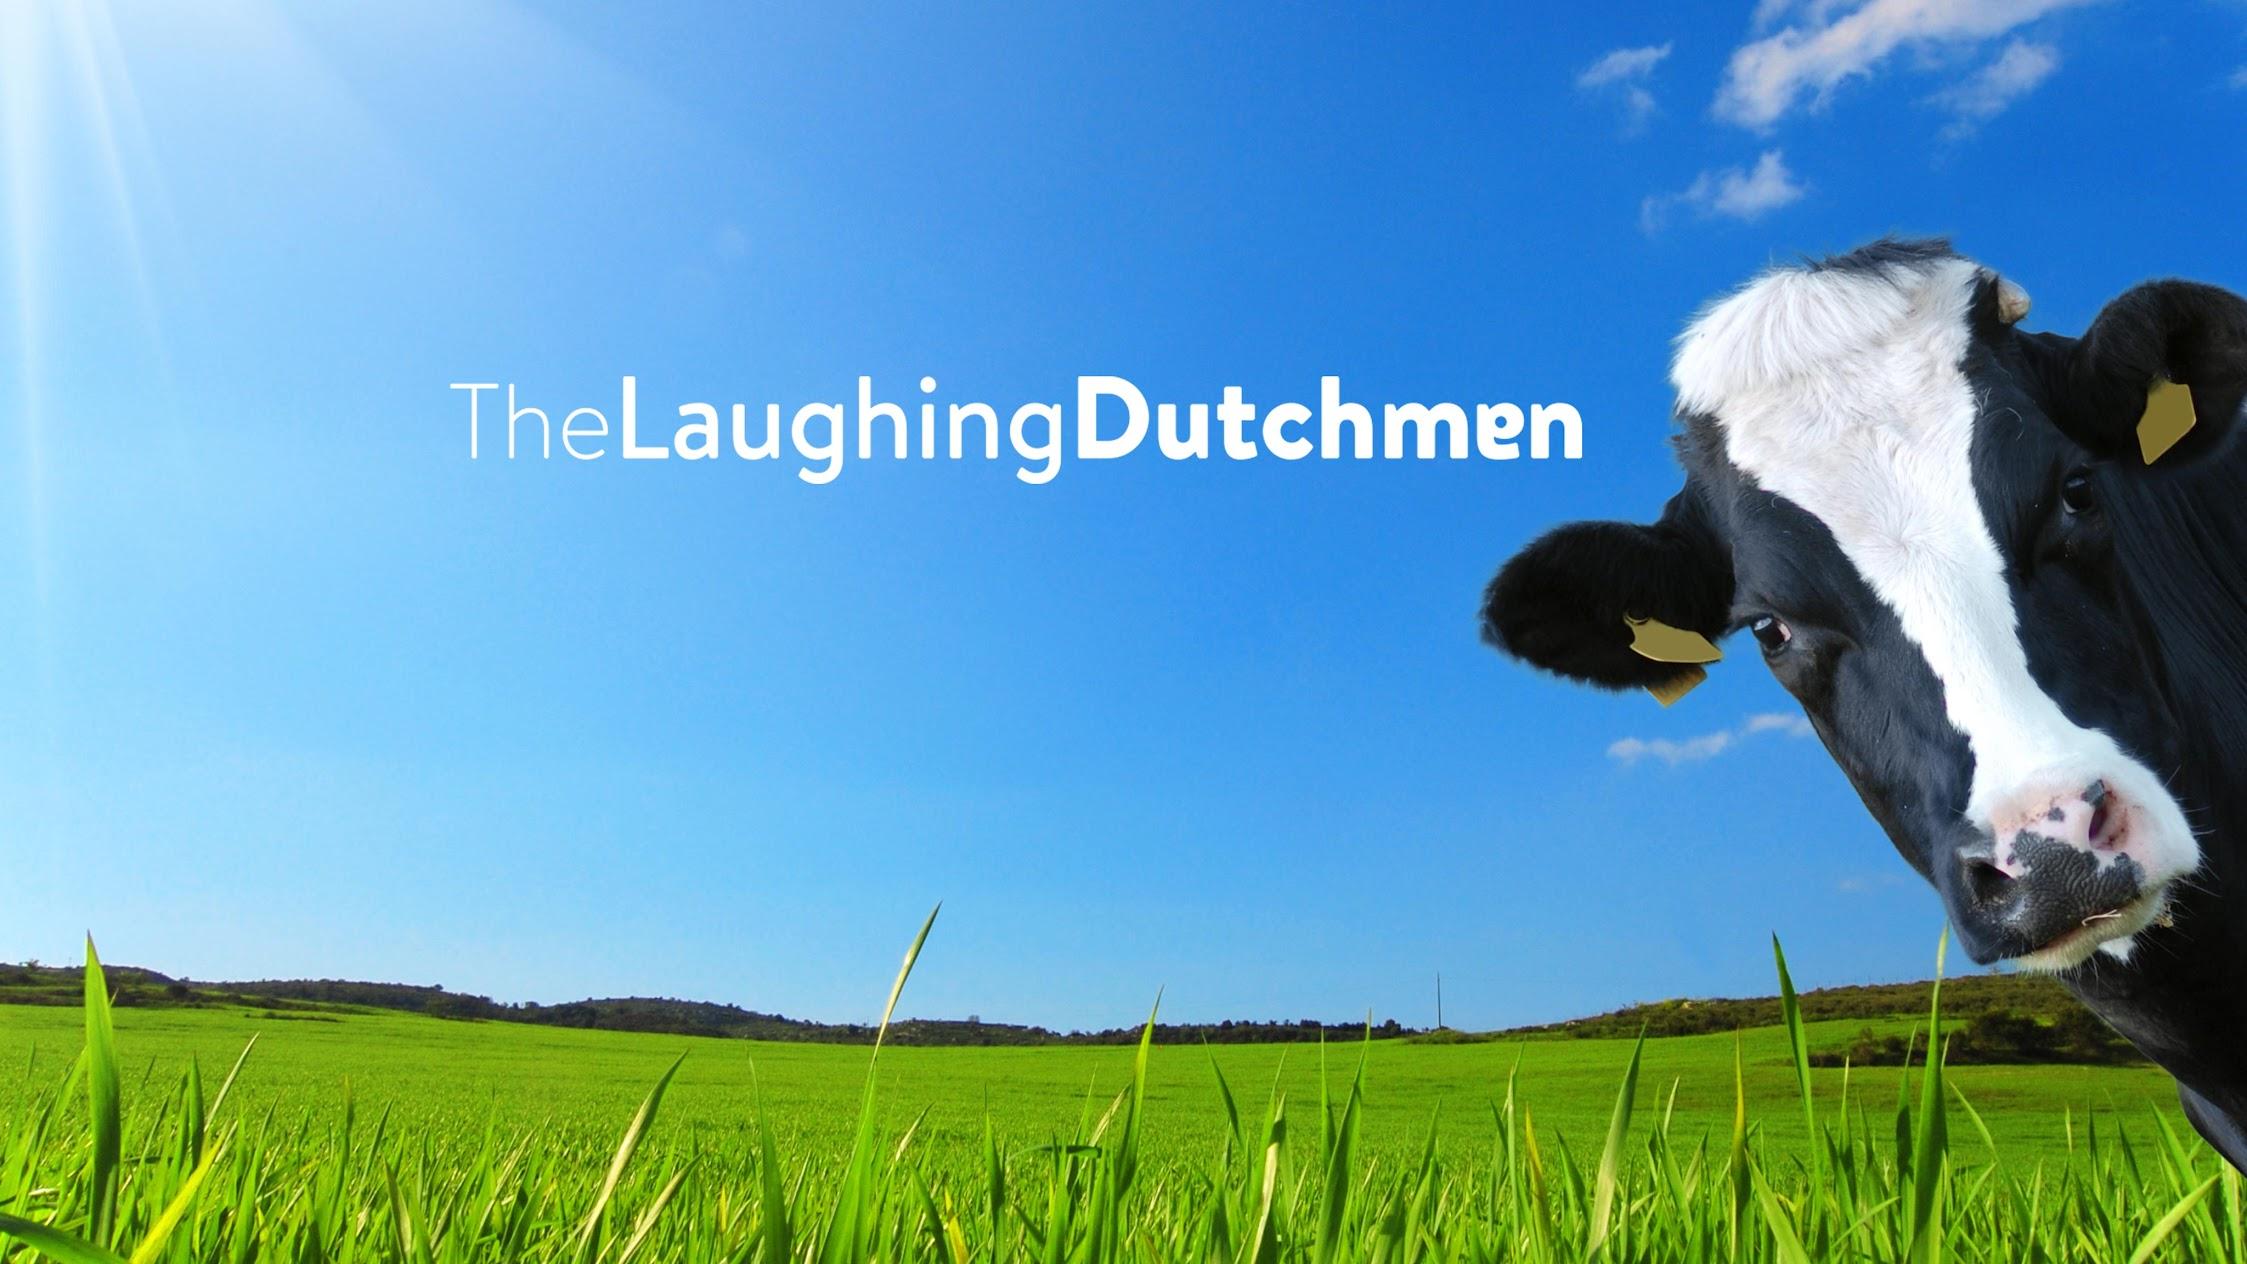 The Laughing Dutchmen